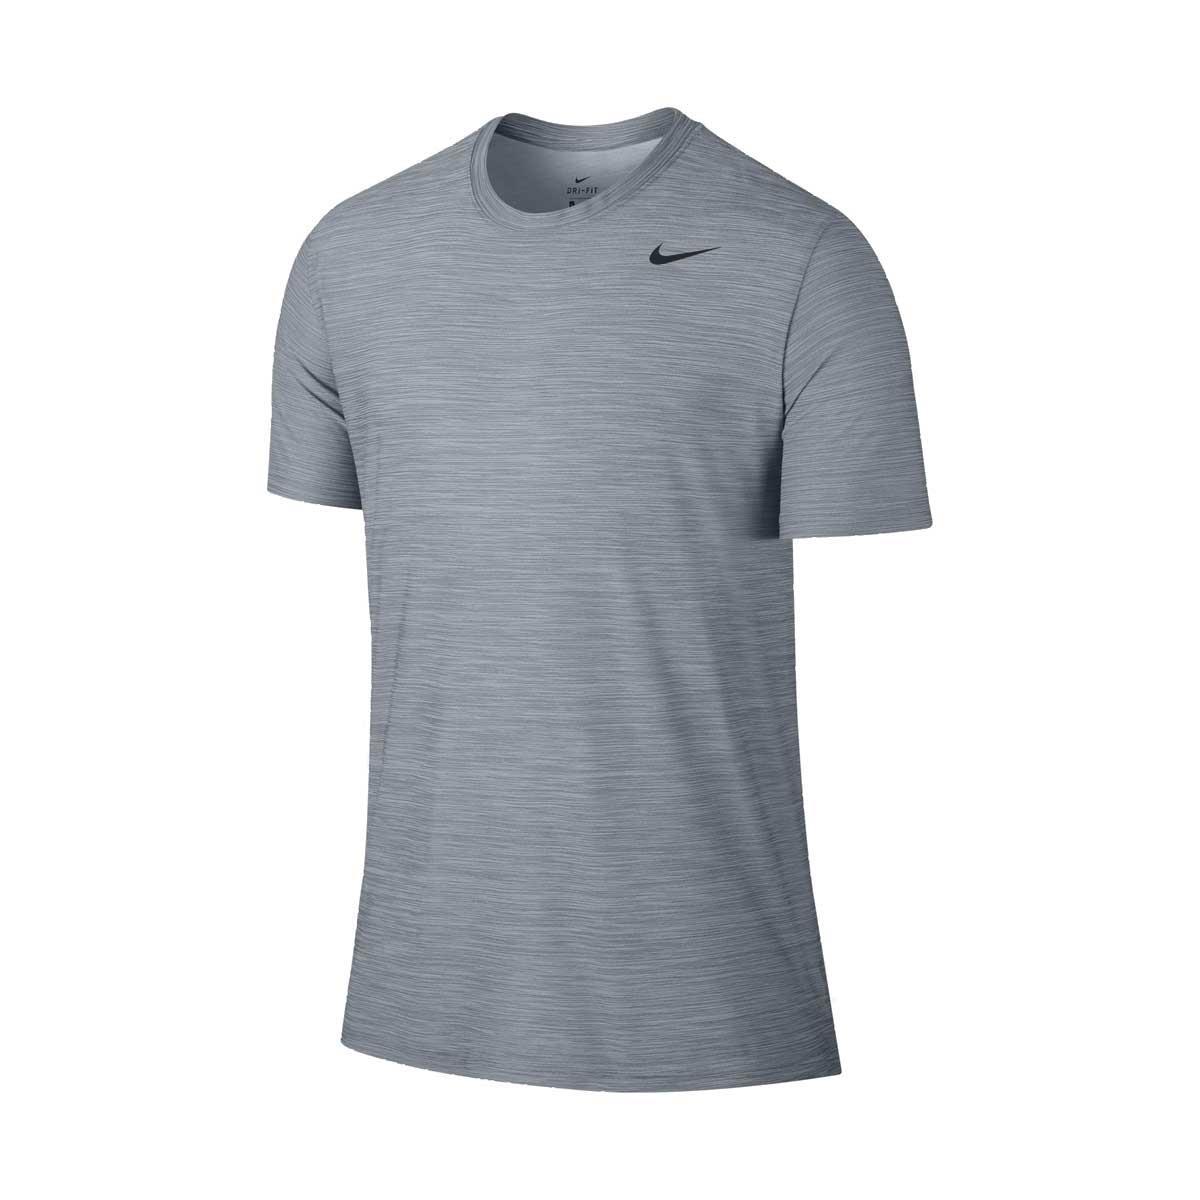 80cab848d5 Camiseta Nike Breathe Top Dry Masculino